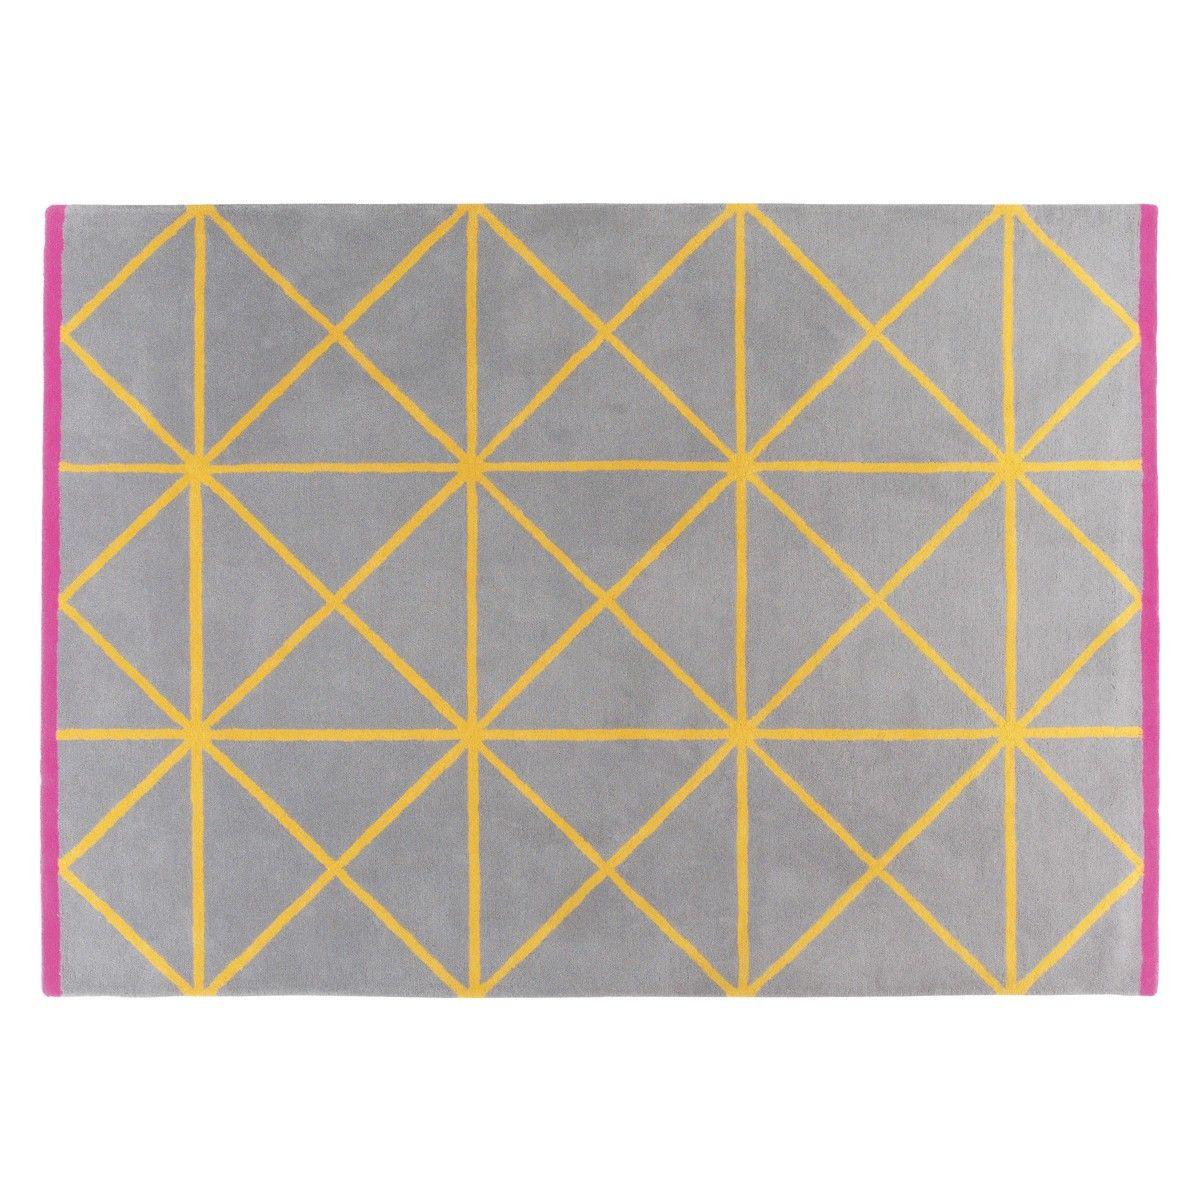 Grid Medium Grey And Yellow Geometric Wool Rug 140 X 200cm Now At Habitat